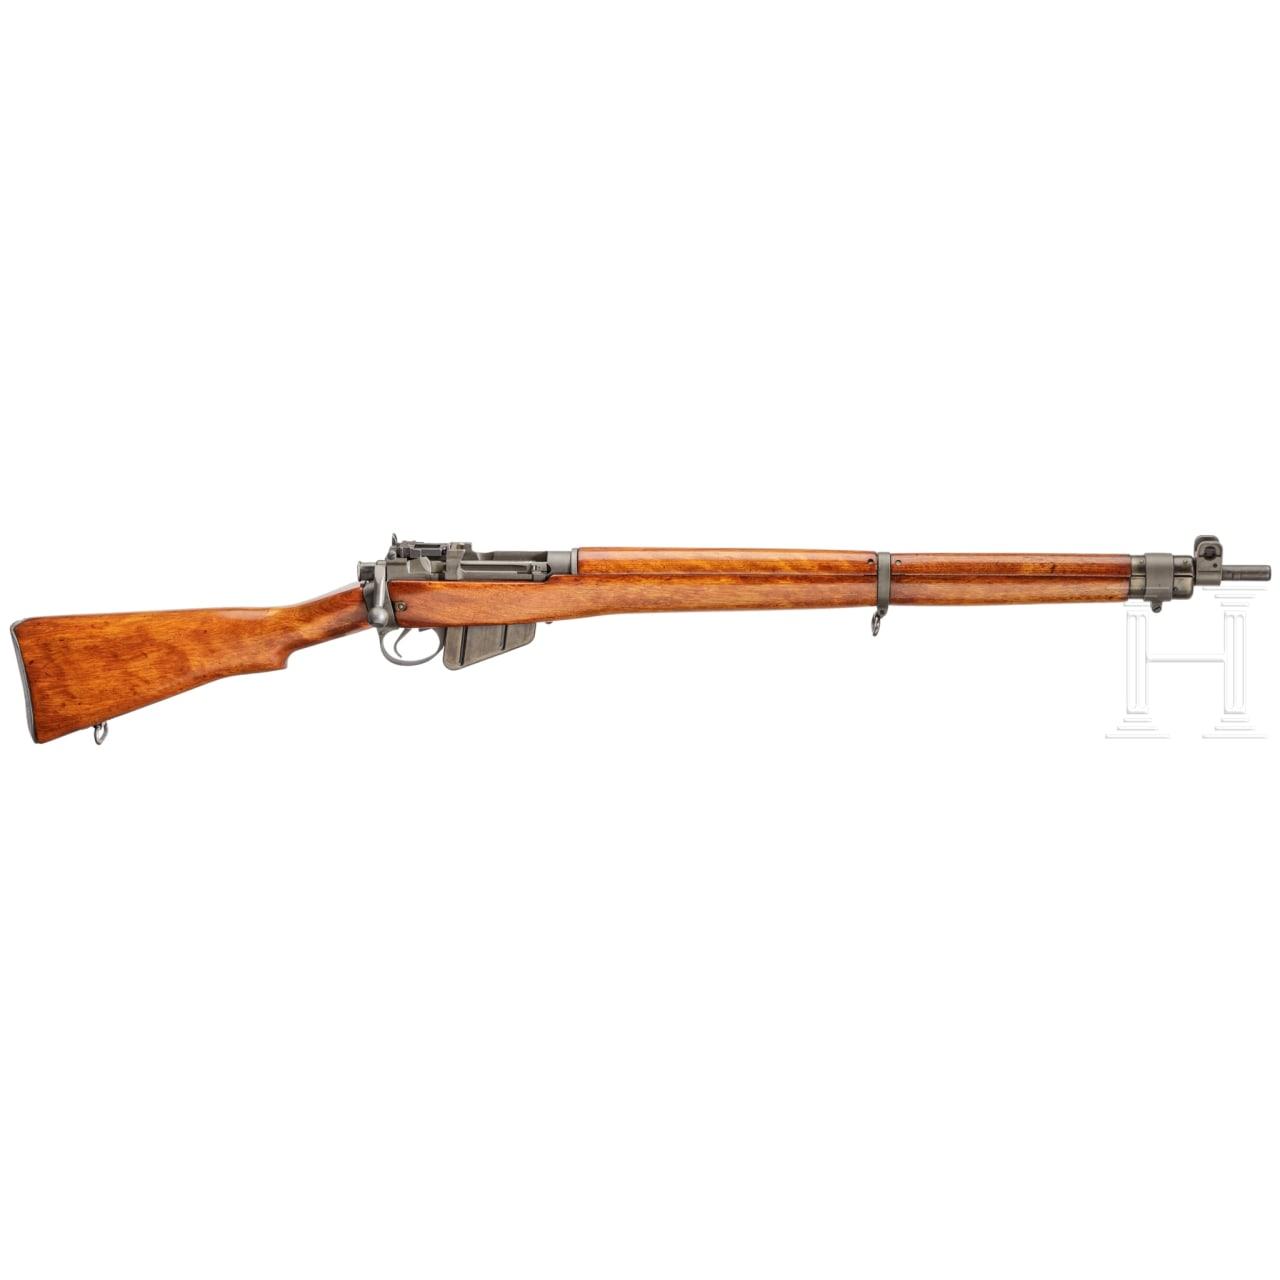 Enfield No. 4 Mk I* - Savage Arms